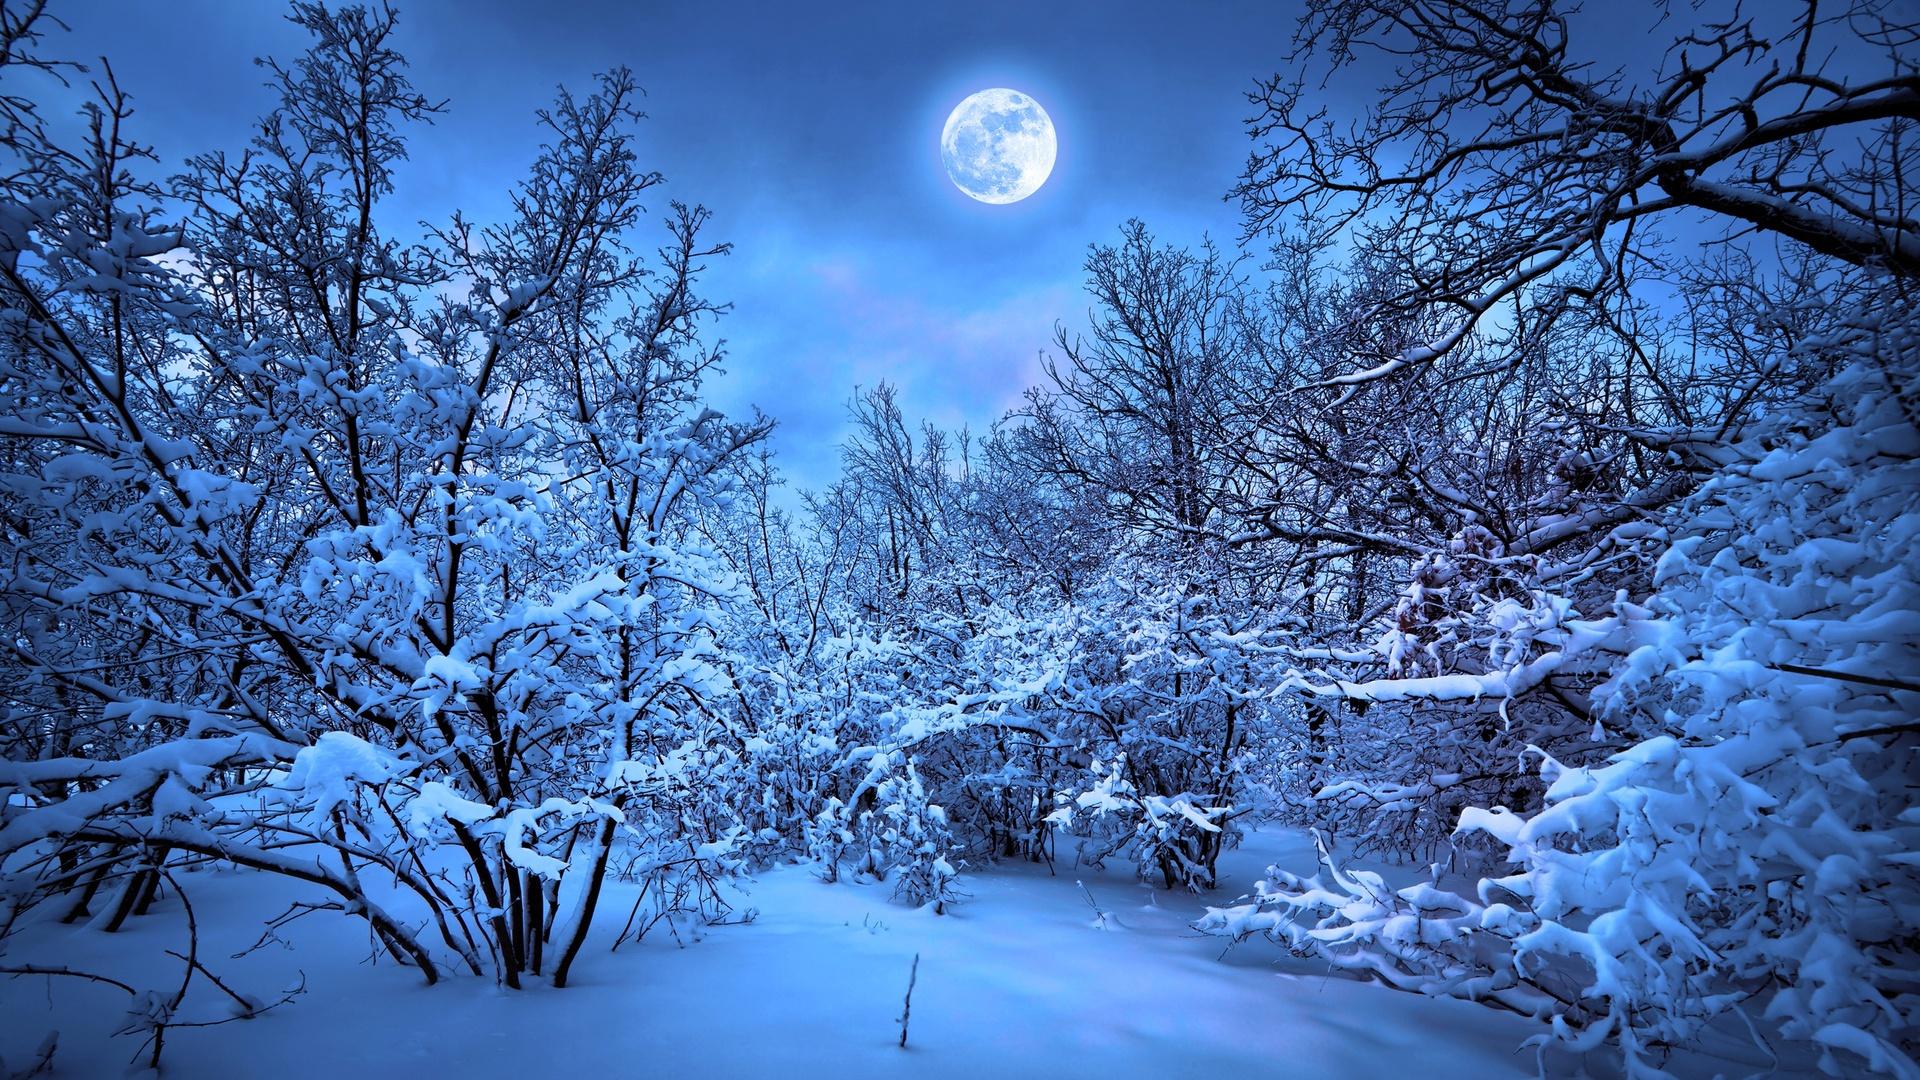 1920x1080 Winter Snow Nature 4k Laptop Full Hd 1080p Hd 4k